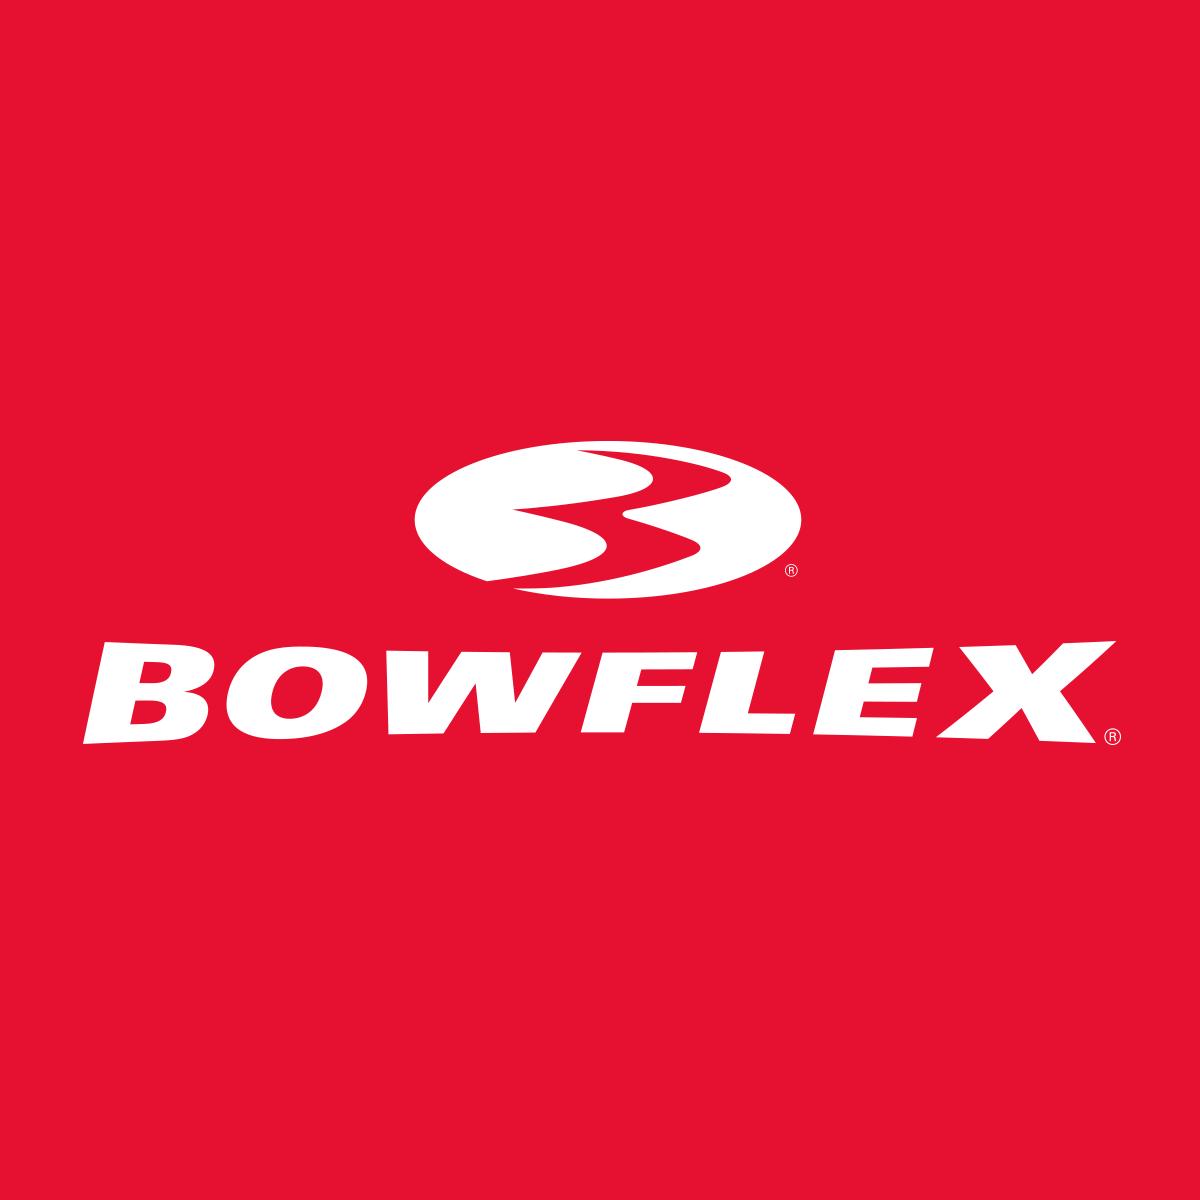 Bowflex Premium Home Exercise Equipment Official Us Site Bowflex